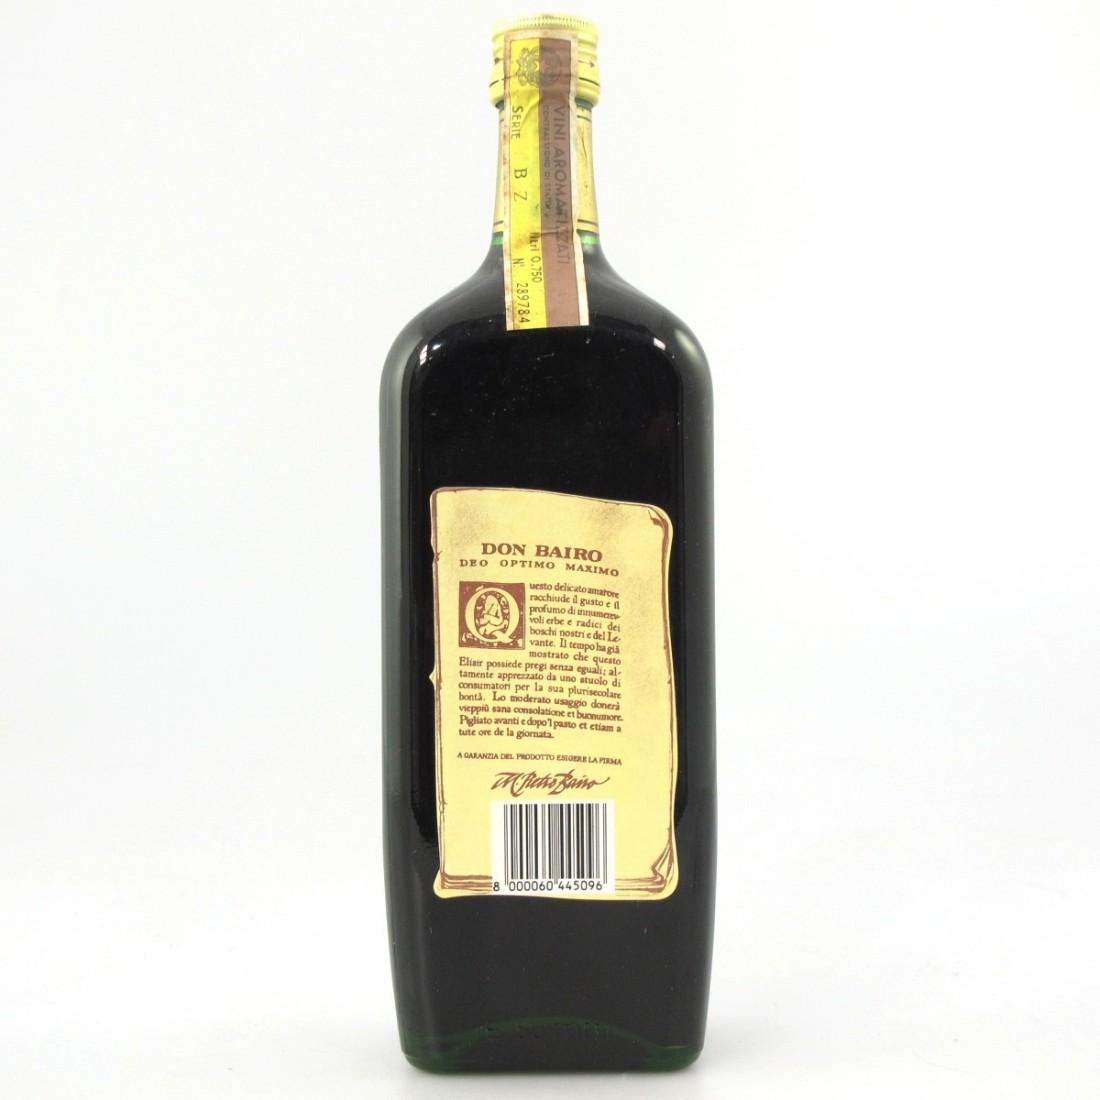 Don Bairo Elisir Amaro 75cl